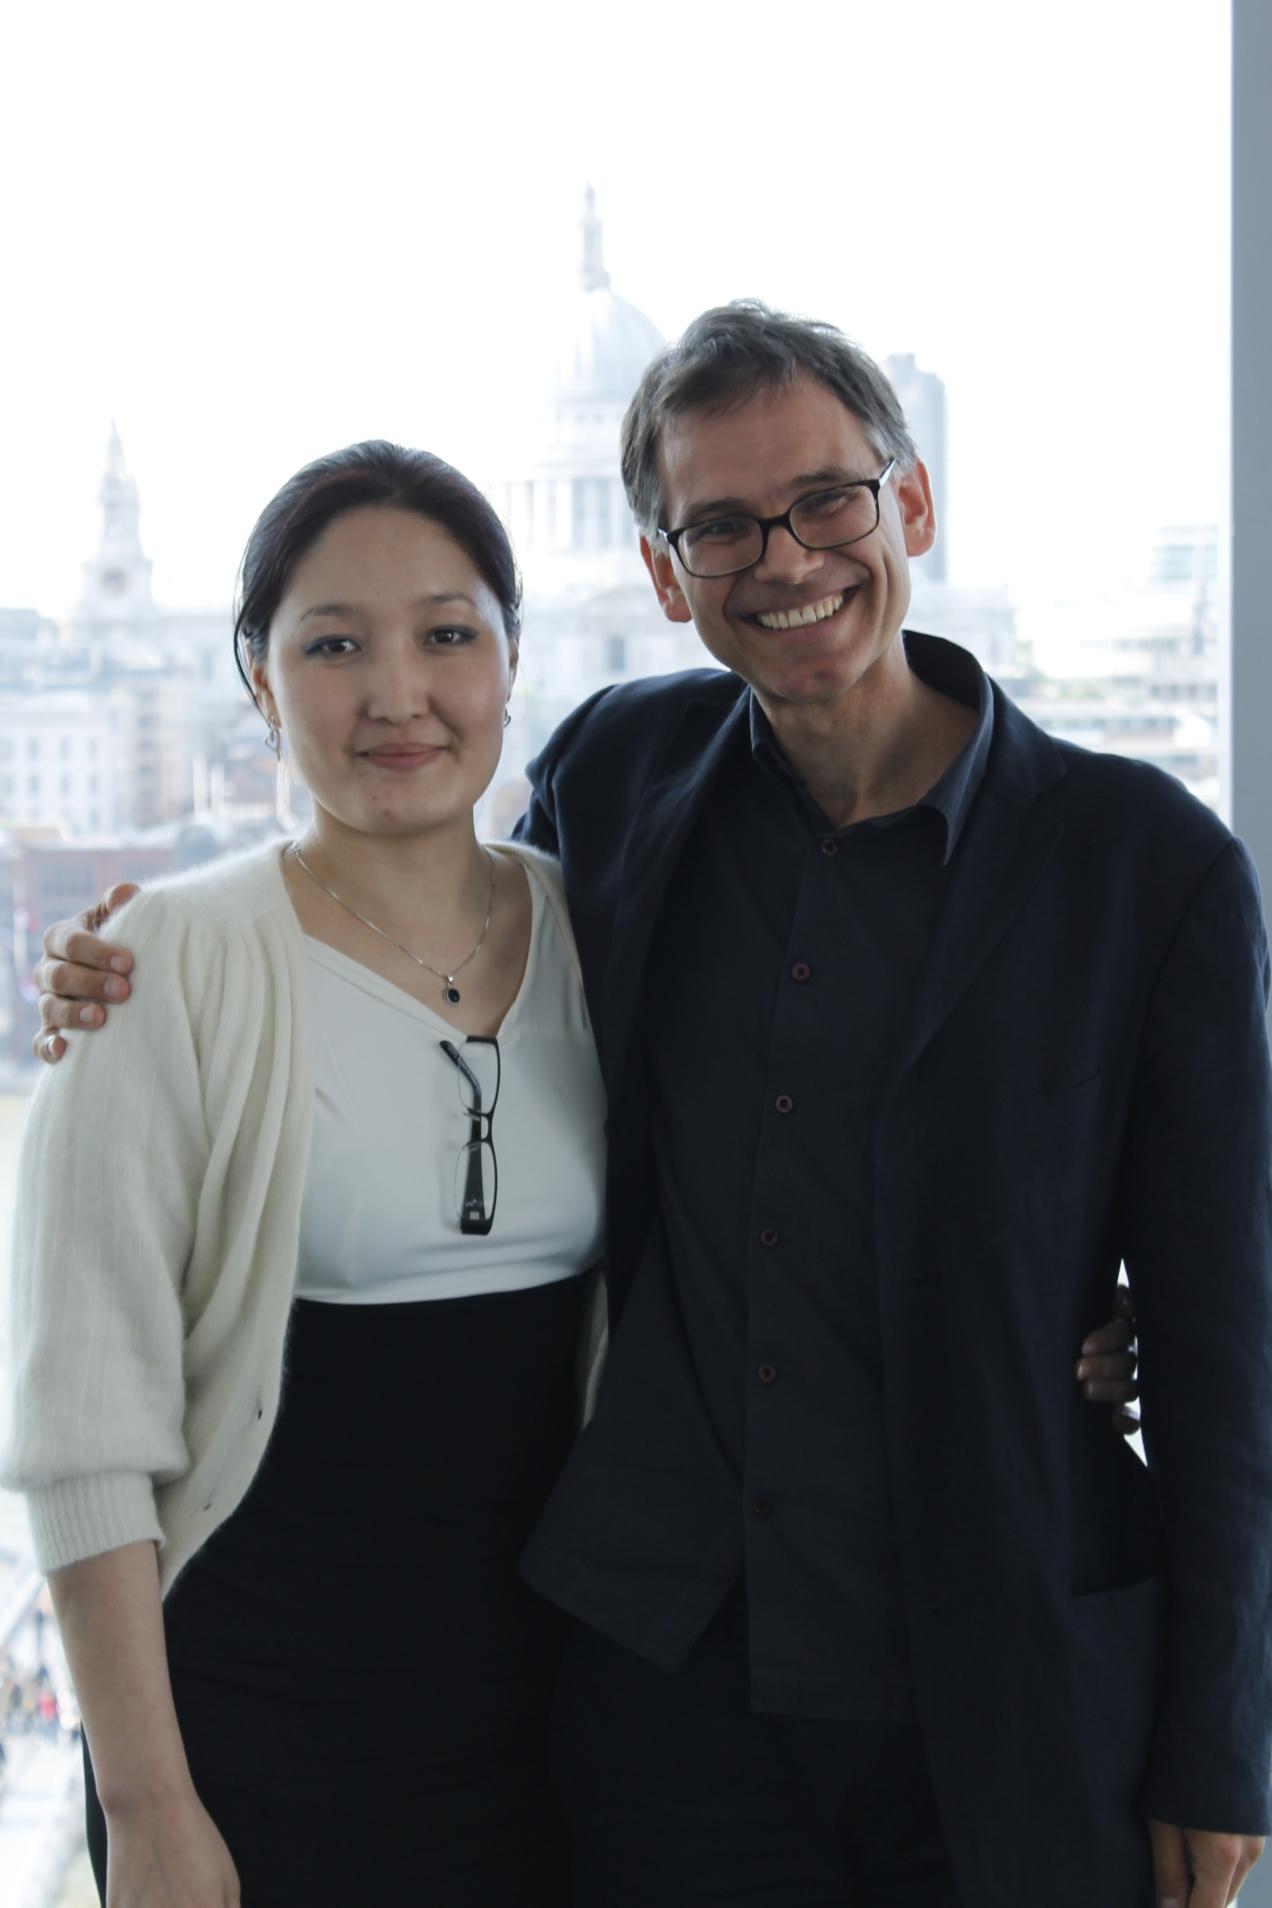 Tsendpurev Tsegmid with Marco Daniel @ Tate Modern conference